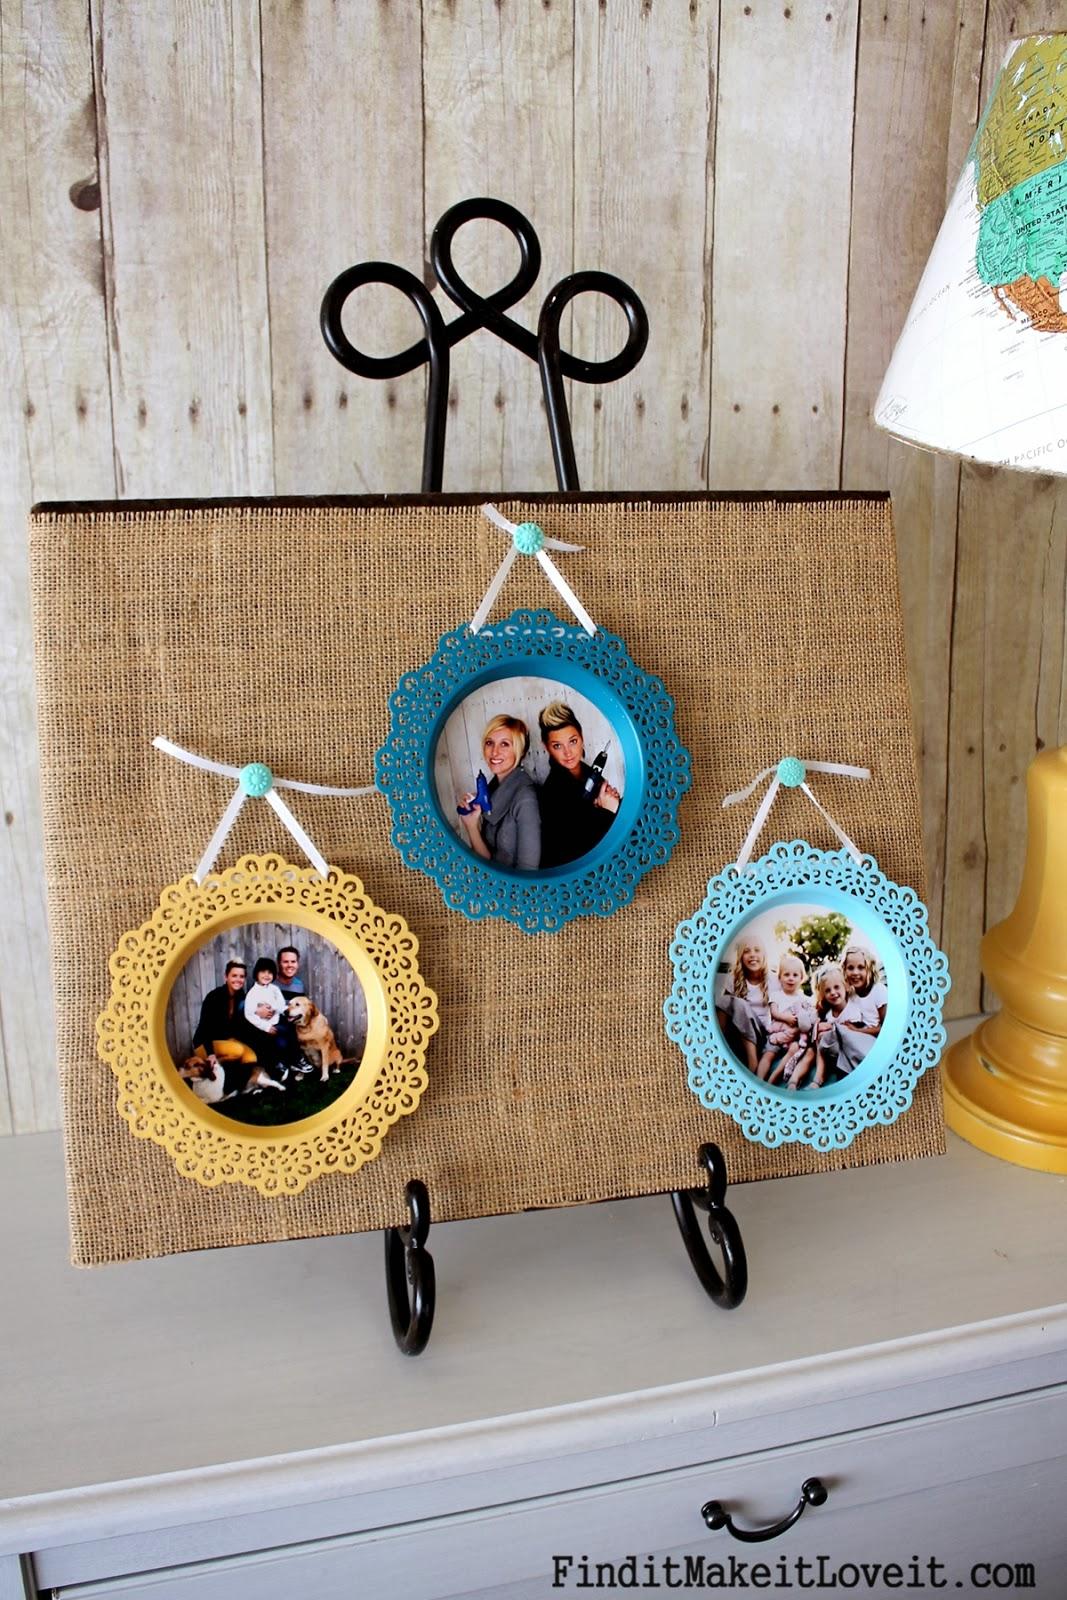 ikea candle dish turned picture frame find it make it. Black Bedroom Furniture Sets. Home Design Ideas